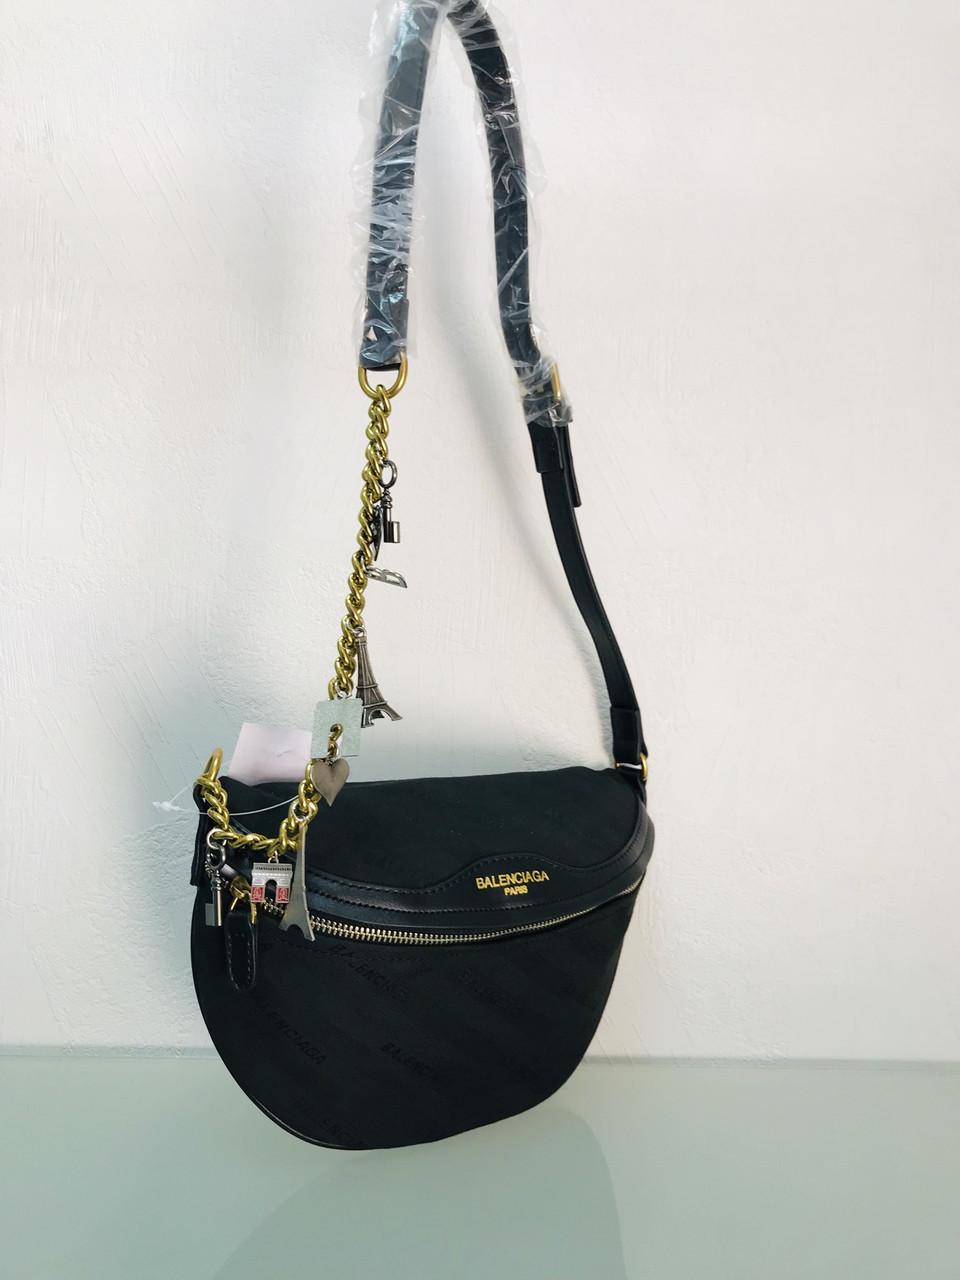 9b82a8d0537c сумка Balenciaga Mini Bag с длинной ручкой копия продажа цена в